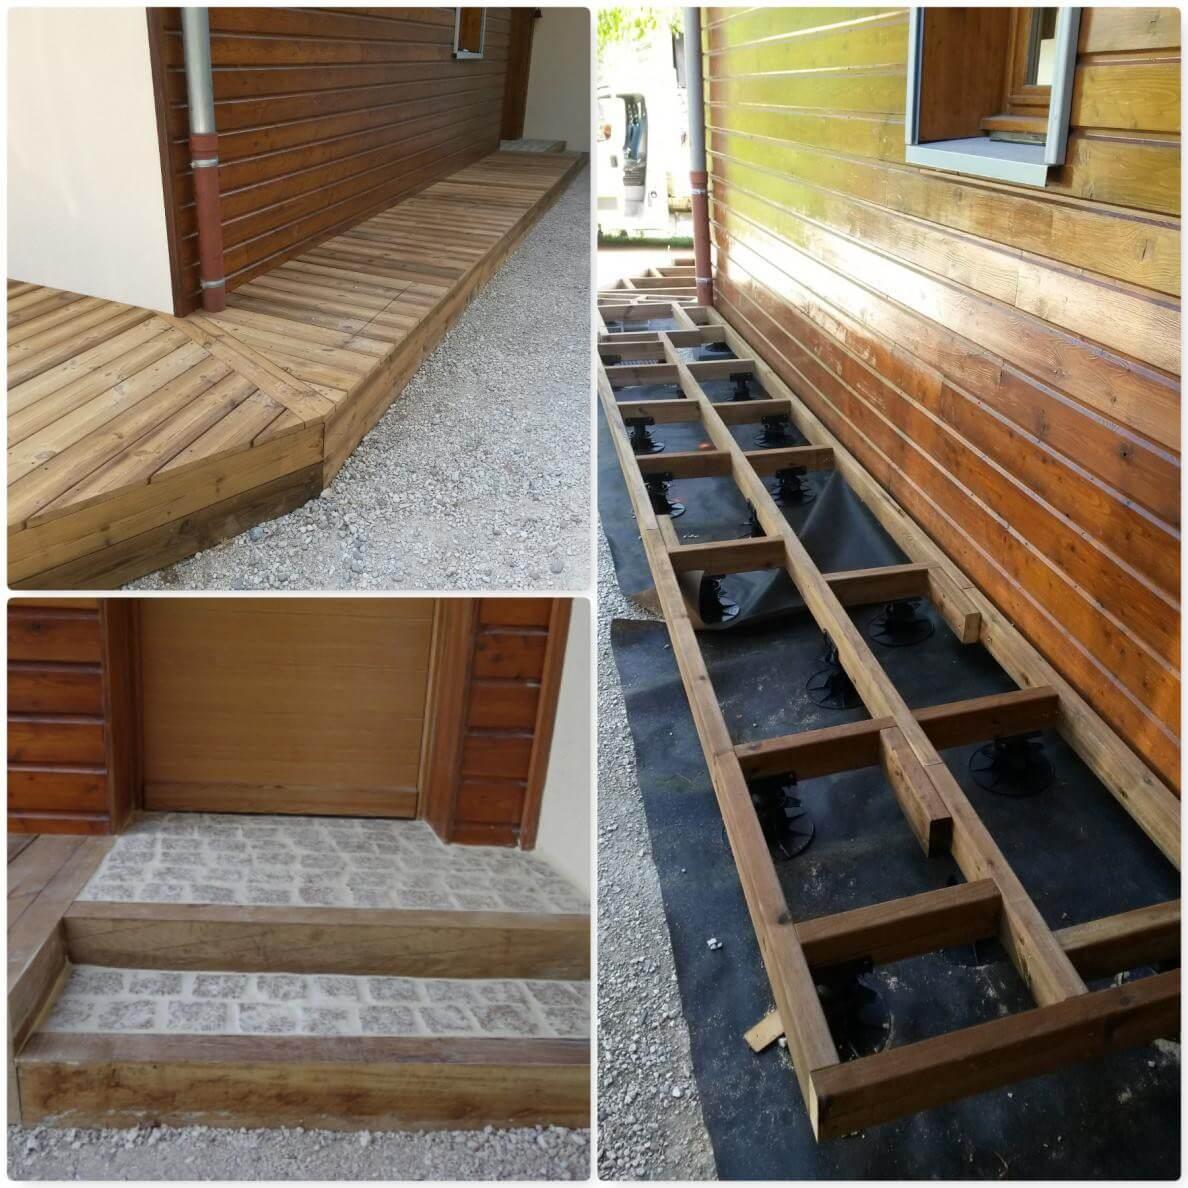 realisation terrasse bois elegant terrasse bois orl ans loire eco bois avec realisation. Black Bedroom Furniture Sets. Home Design Ideas